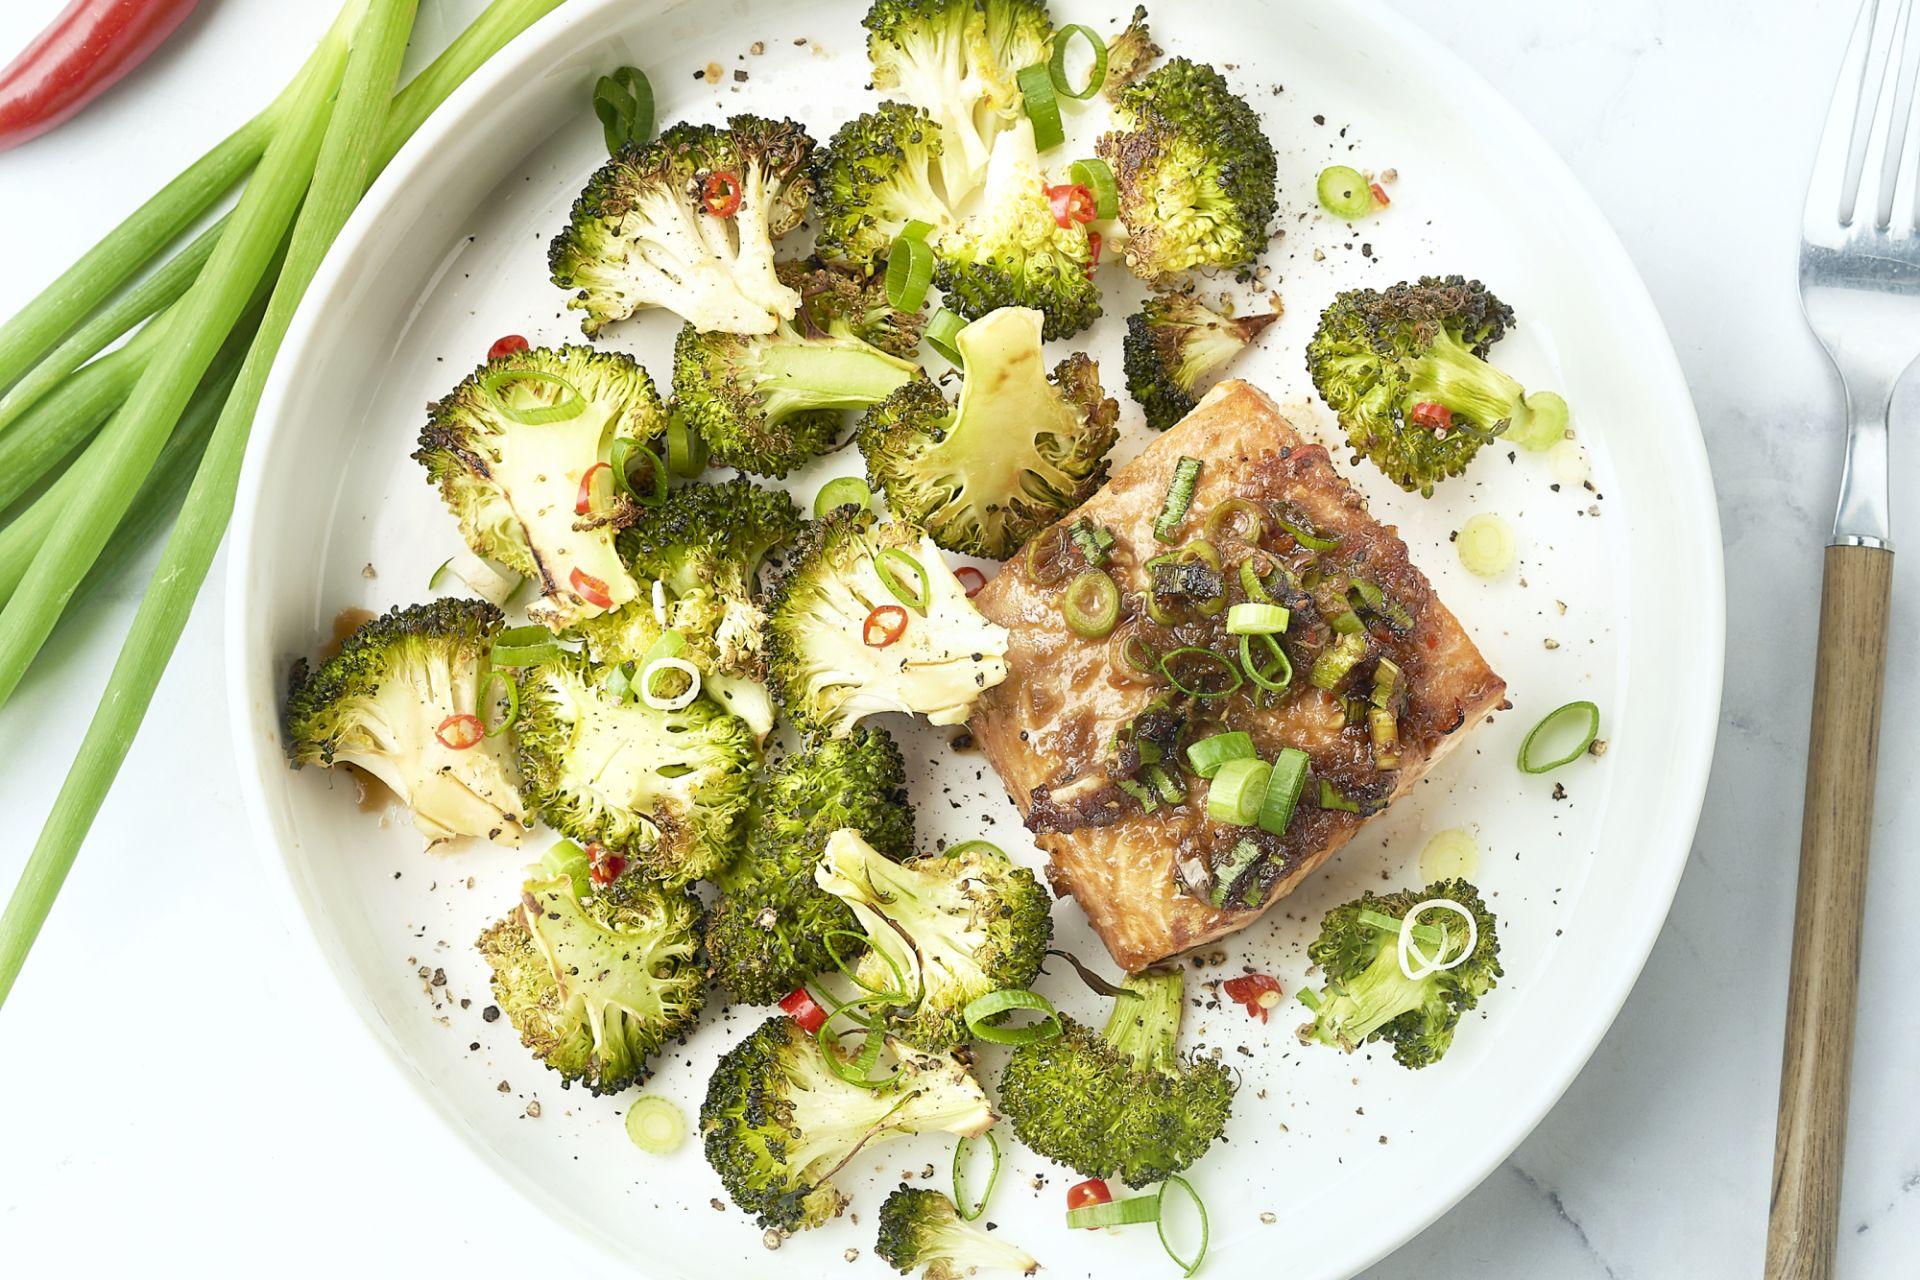 'Traybake' met zalm en broccoli